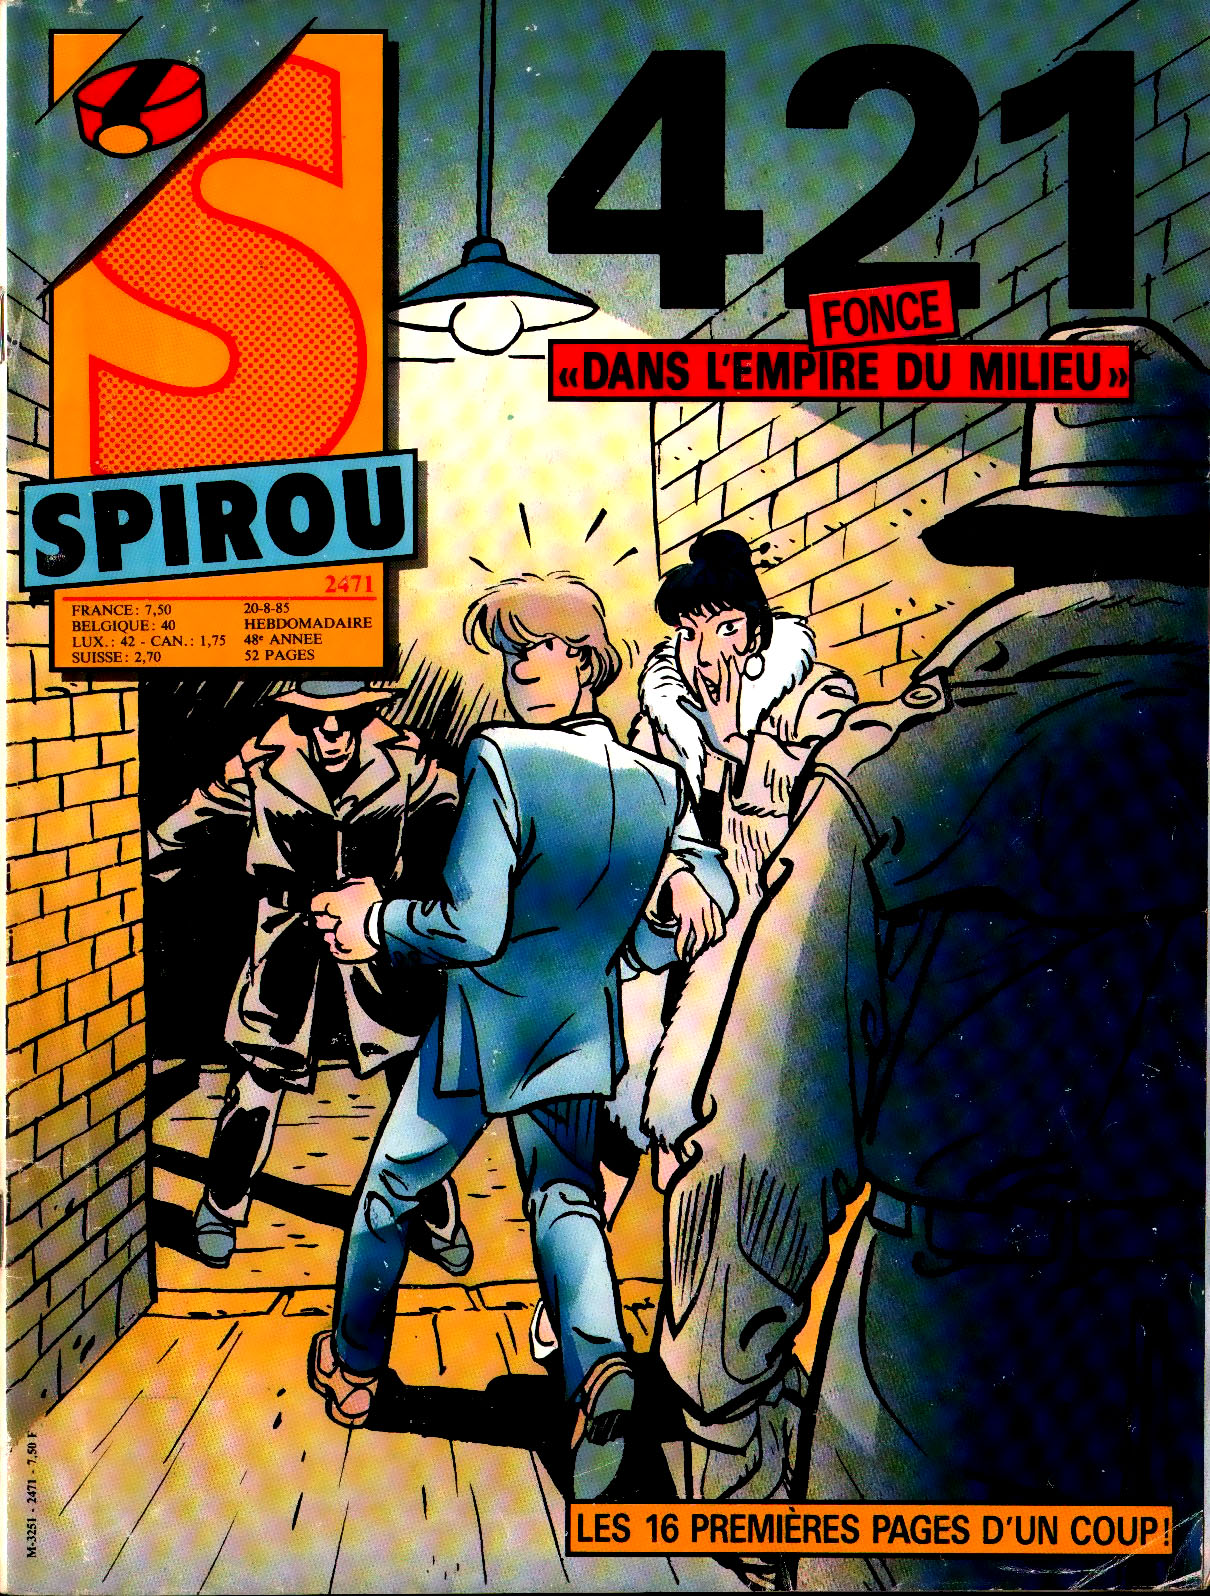 421 - maltaite - desberg - couverture Spirou 2